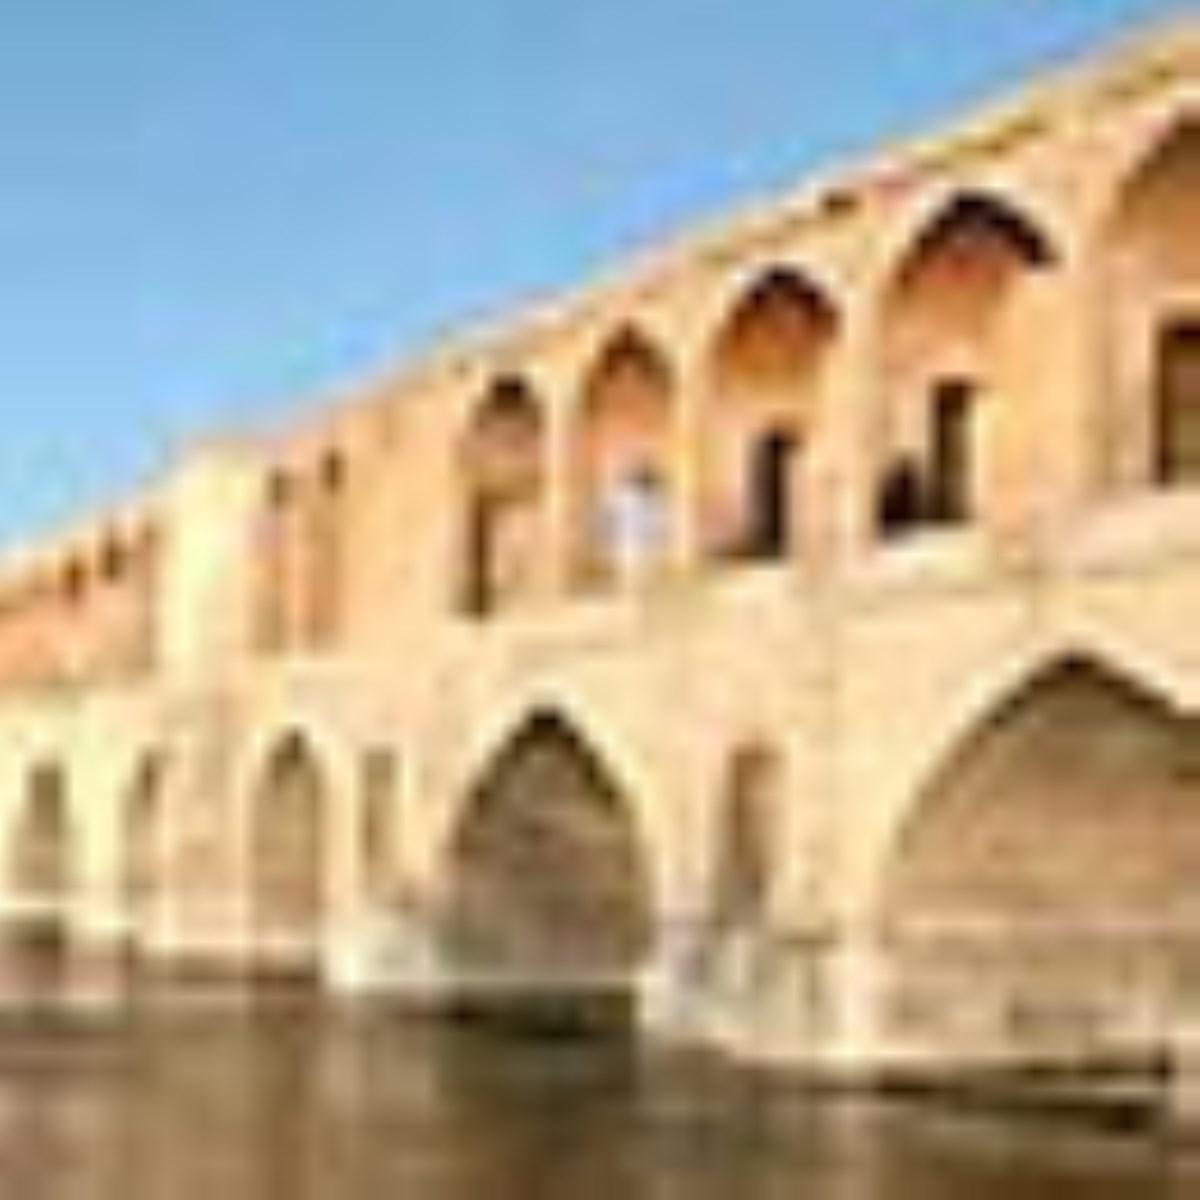 اصفهان عهد مغول